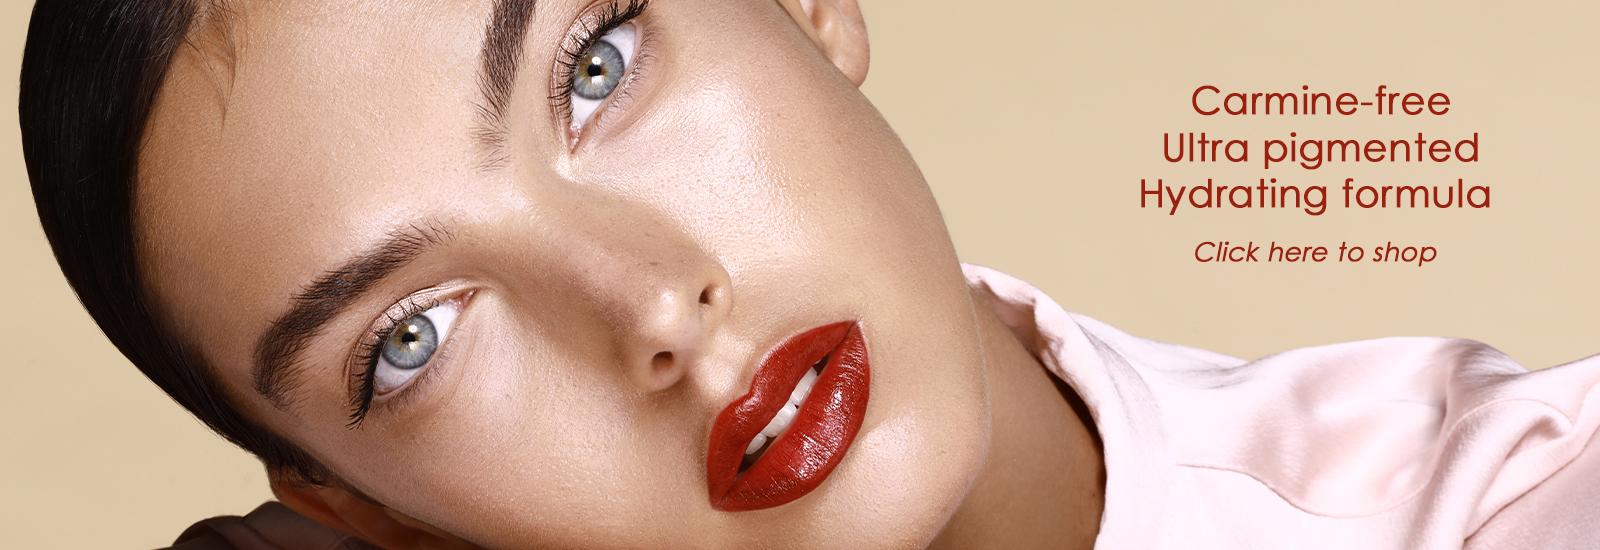 No Carmine red lipstick